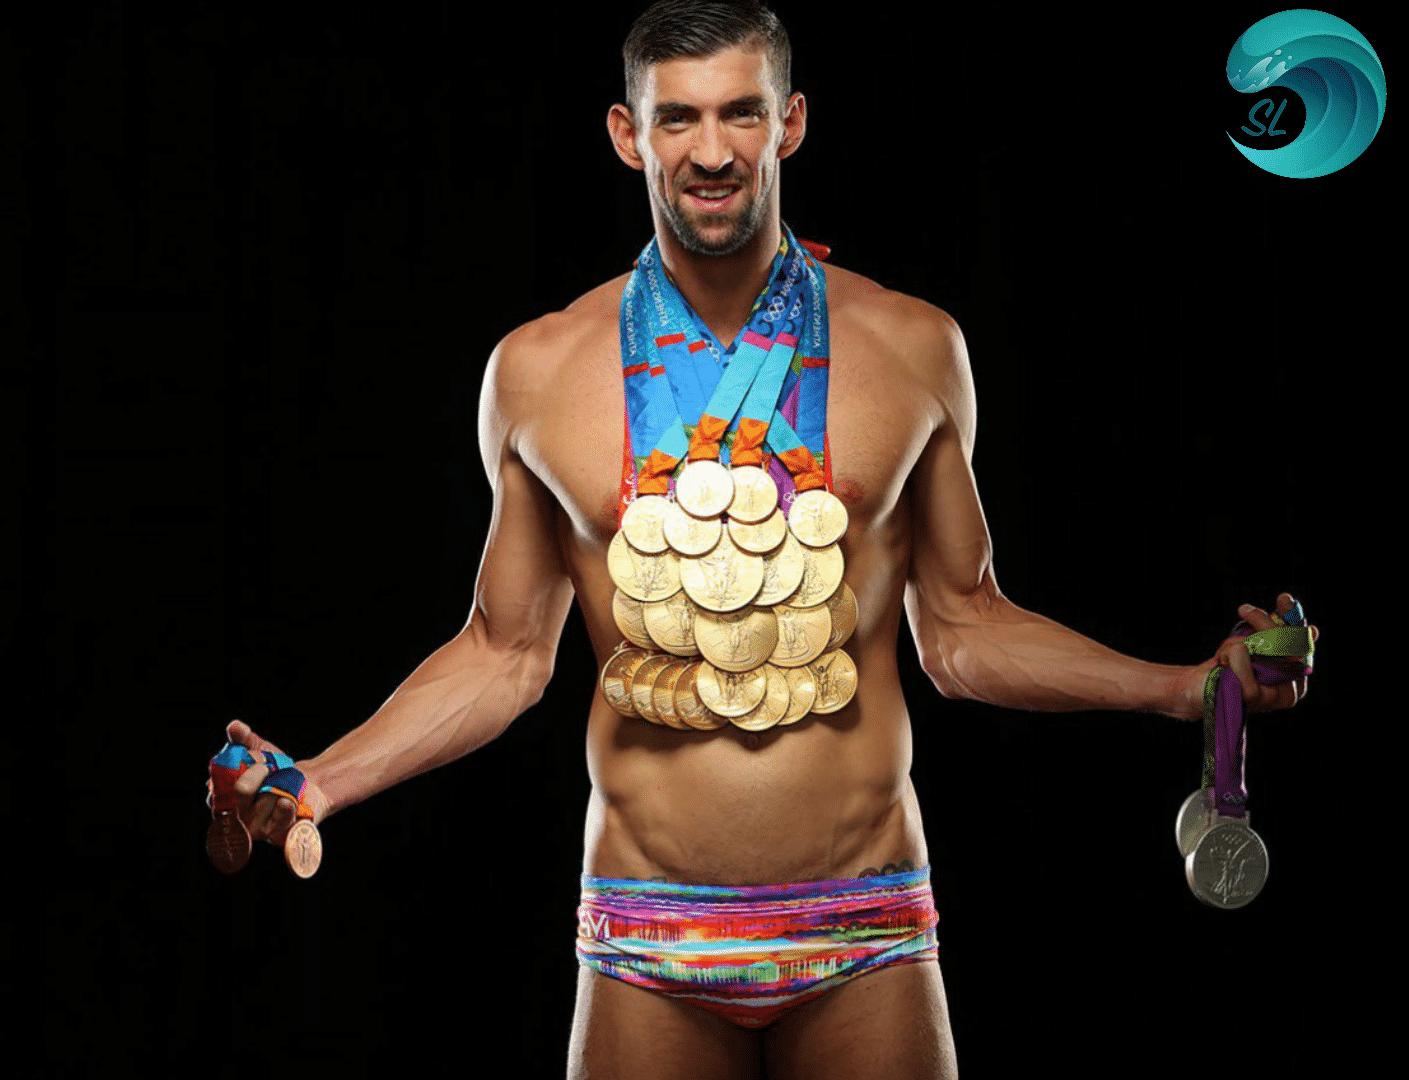 Майкл Фелпс — американский олимпийский чемпион